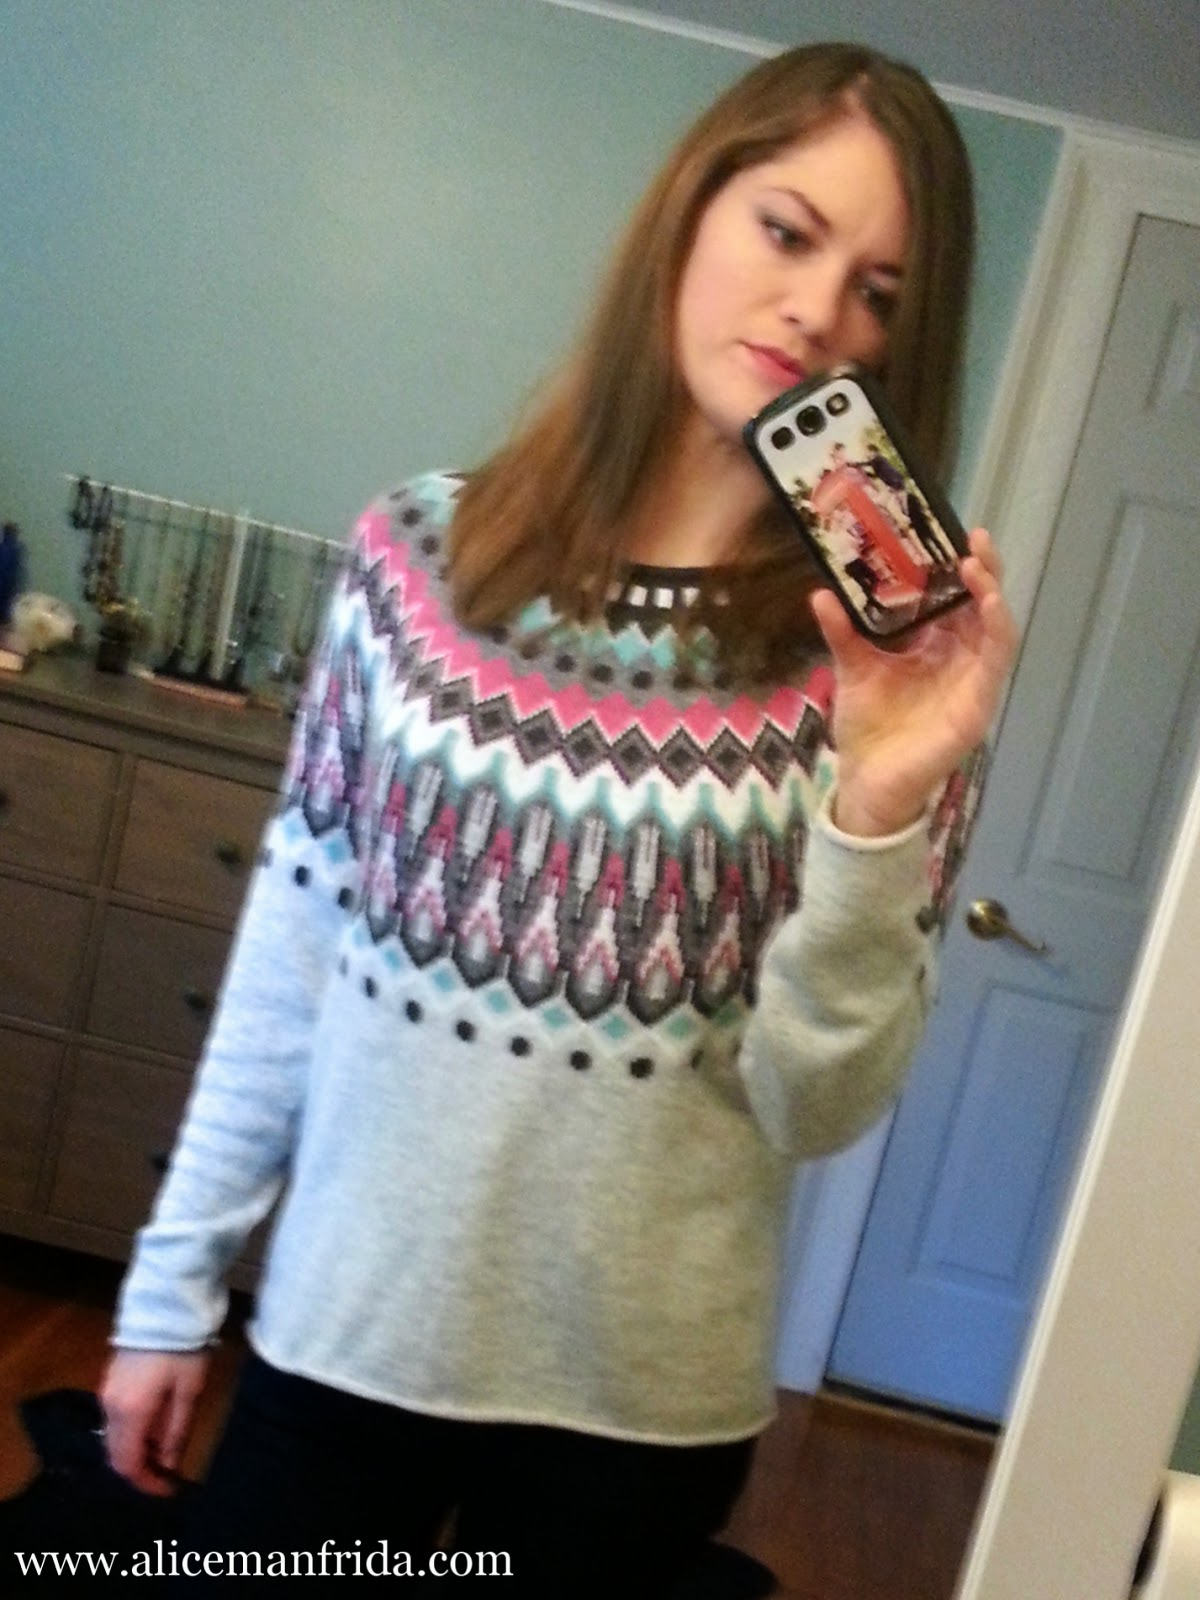 ootd, H&M, jacquard-knit sweater, light gray